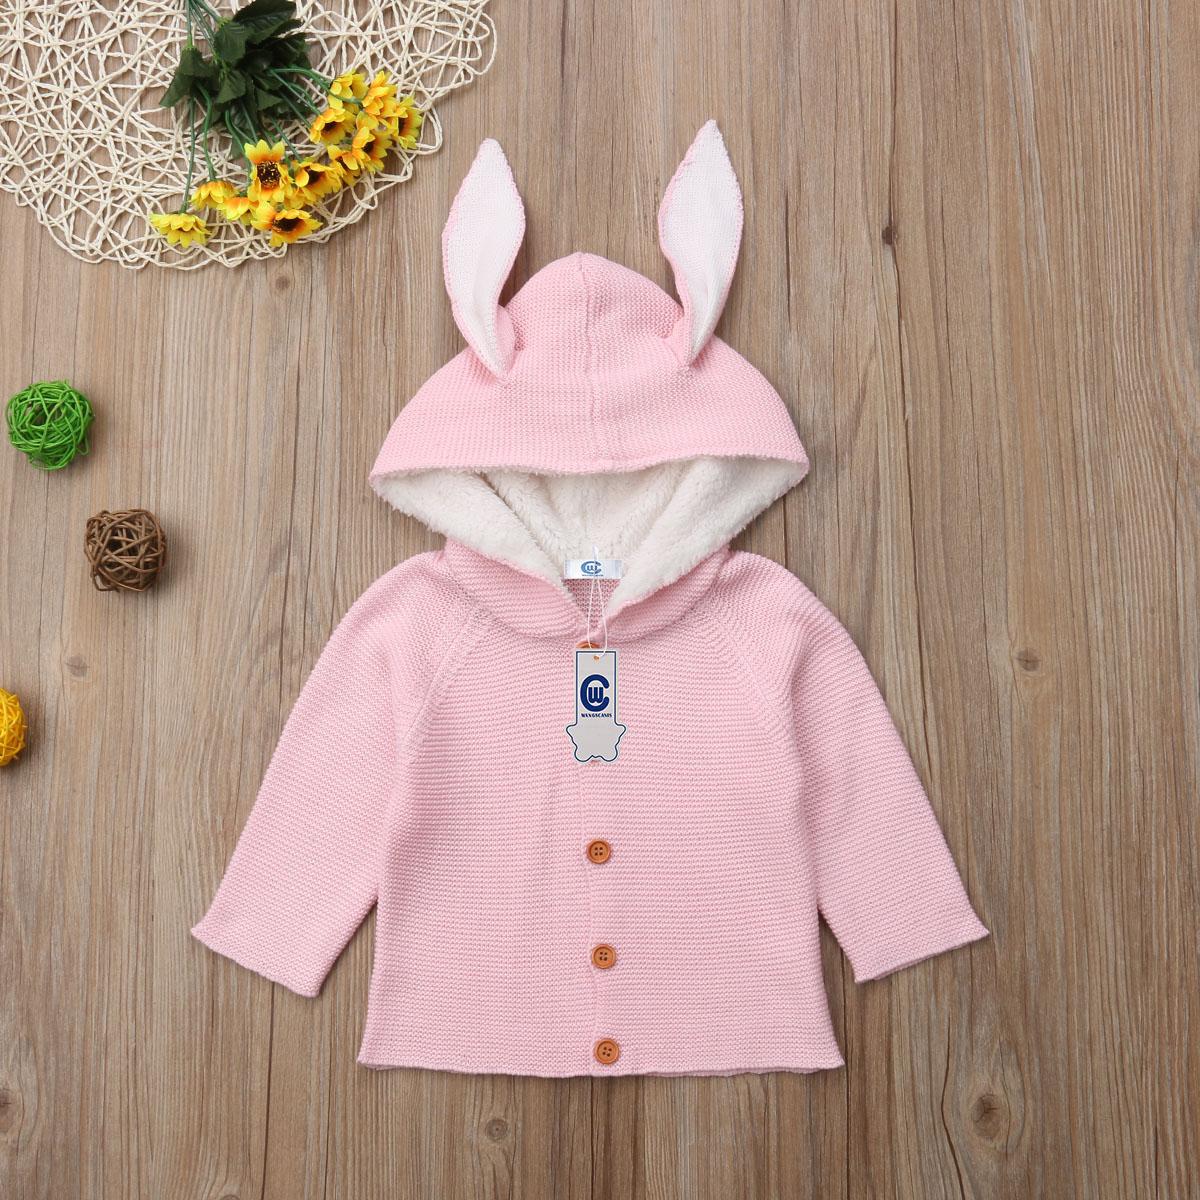 UK Newborn Baby Boys Girls Warm Knitted Cardigan Coat Jacket Outwear Clothes